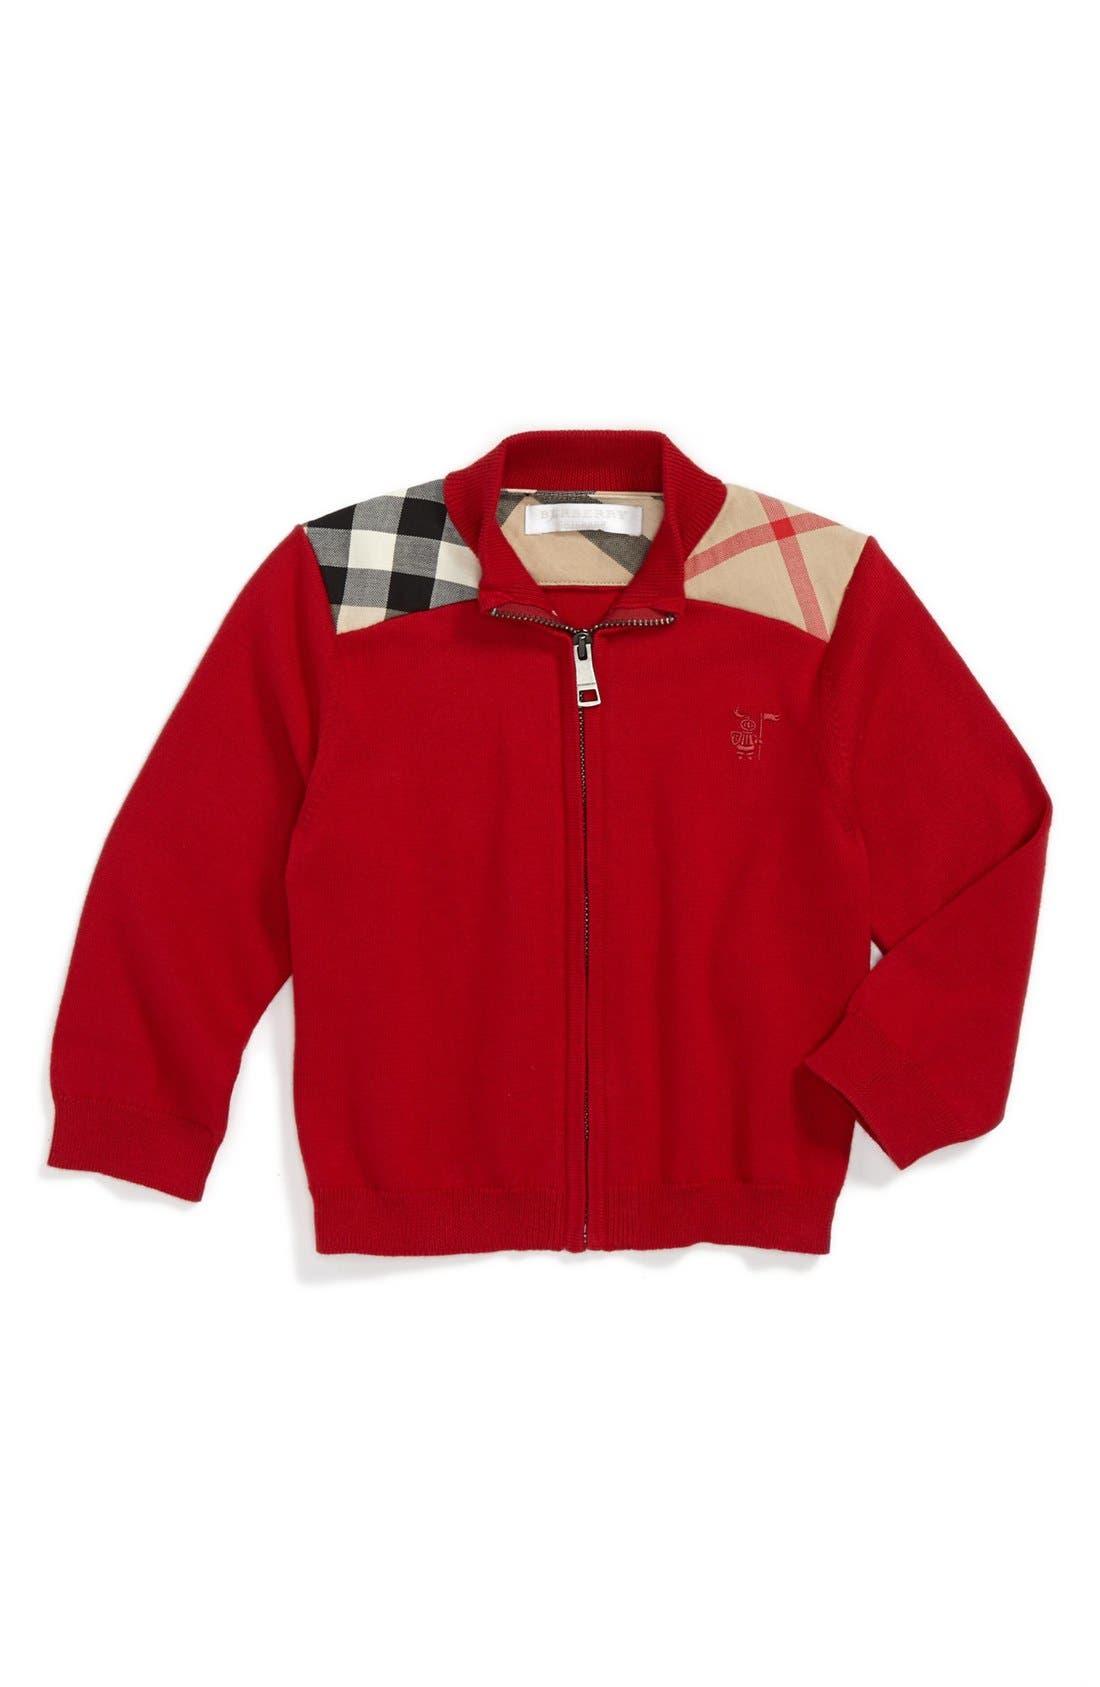 Main Image - Burberry 'Christian' Sweater (Baby Boys)